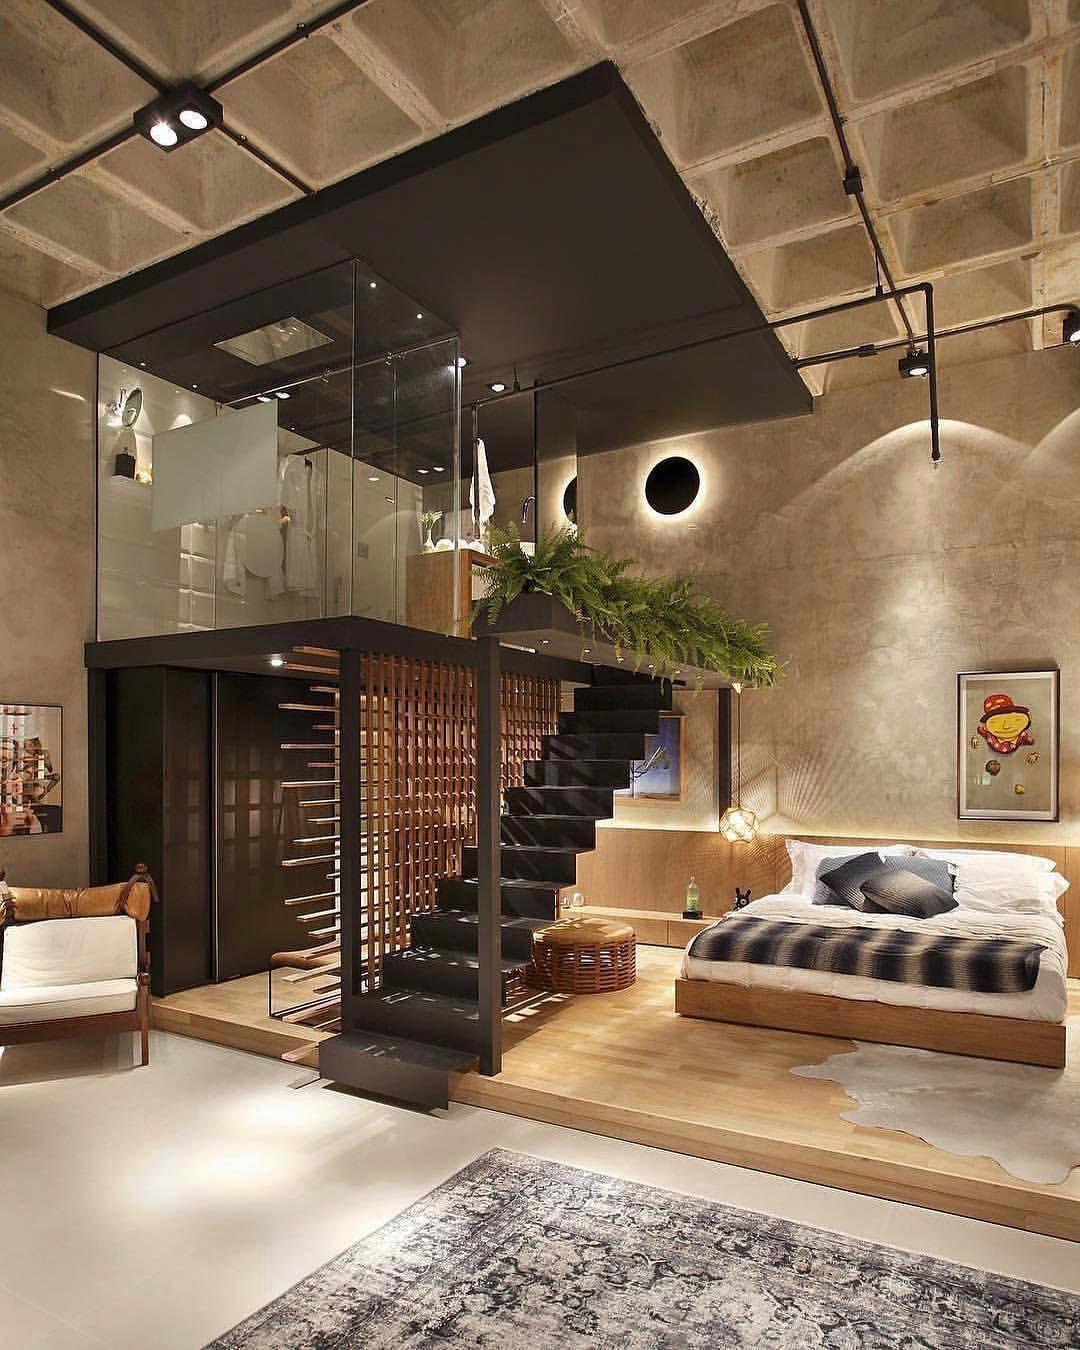 Loft Design pin by boww cholchalatarn on daily dressing loft